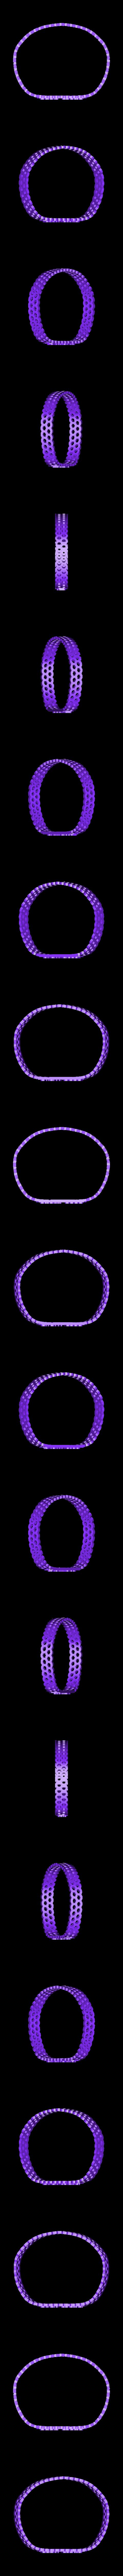 CUSTOM Hexagon Bracelet.stl Download STL file Jewelry Pack - Bracelet Wristband Pendant Military Dog Tag Heart • 3D printer model, Custom3DPrinting